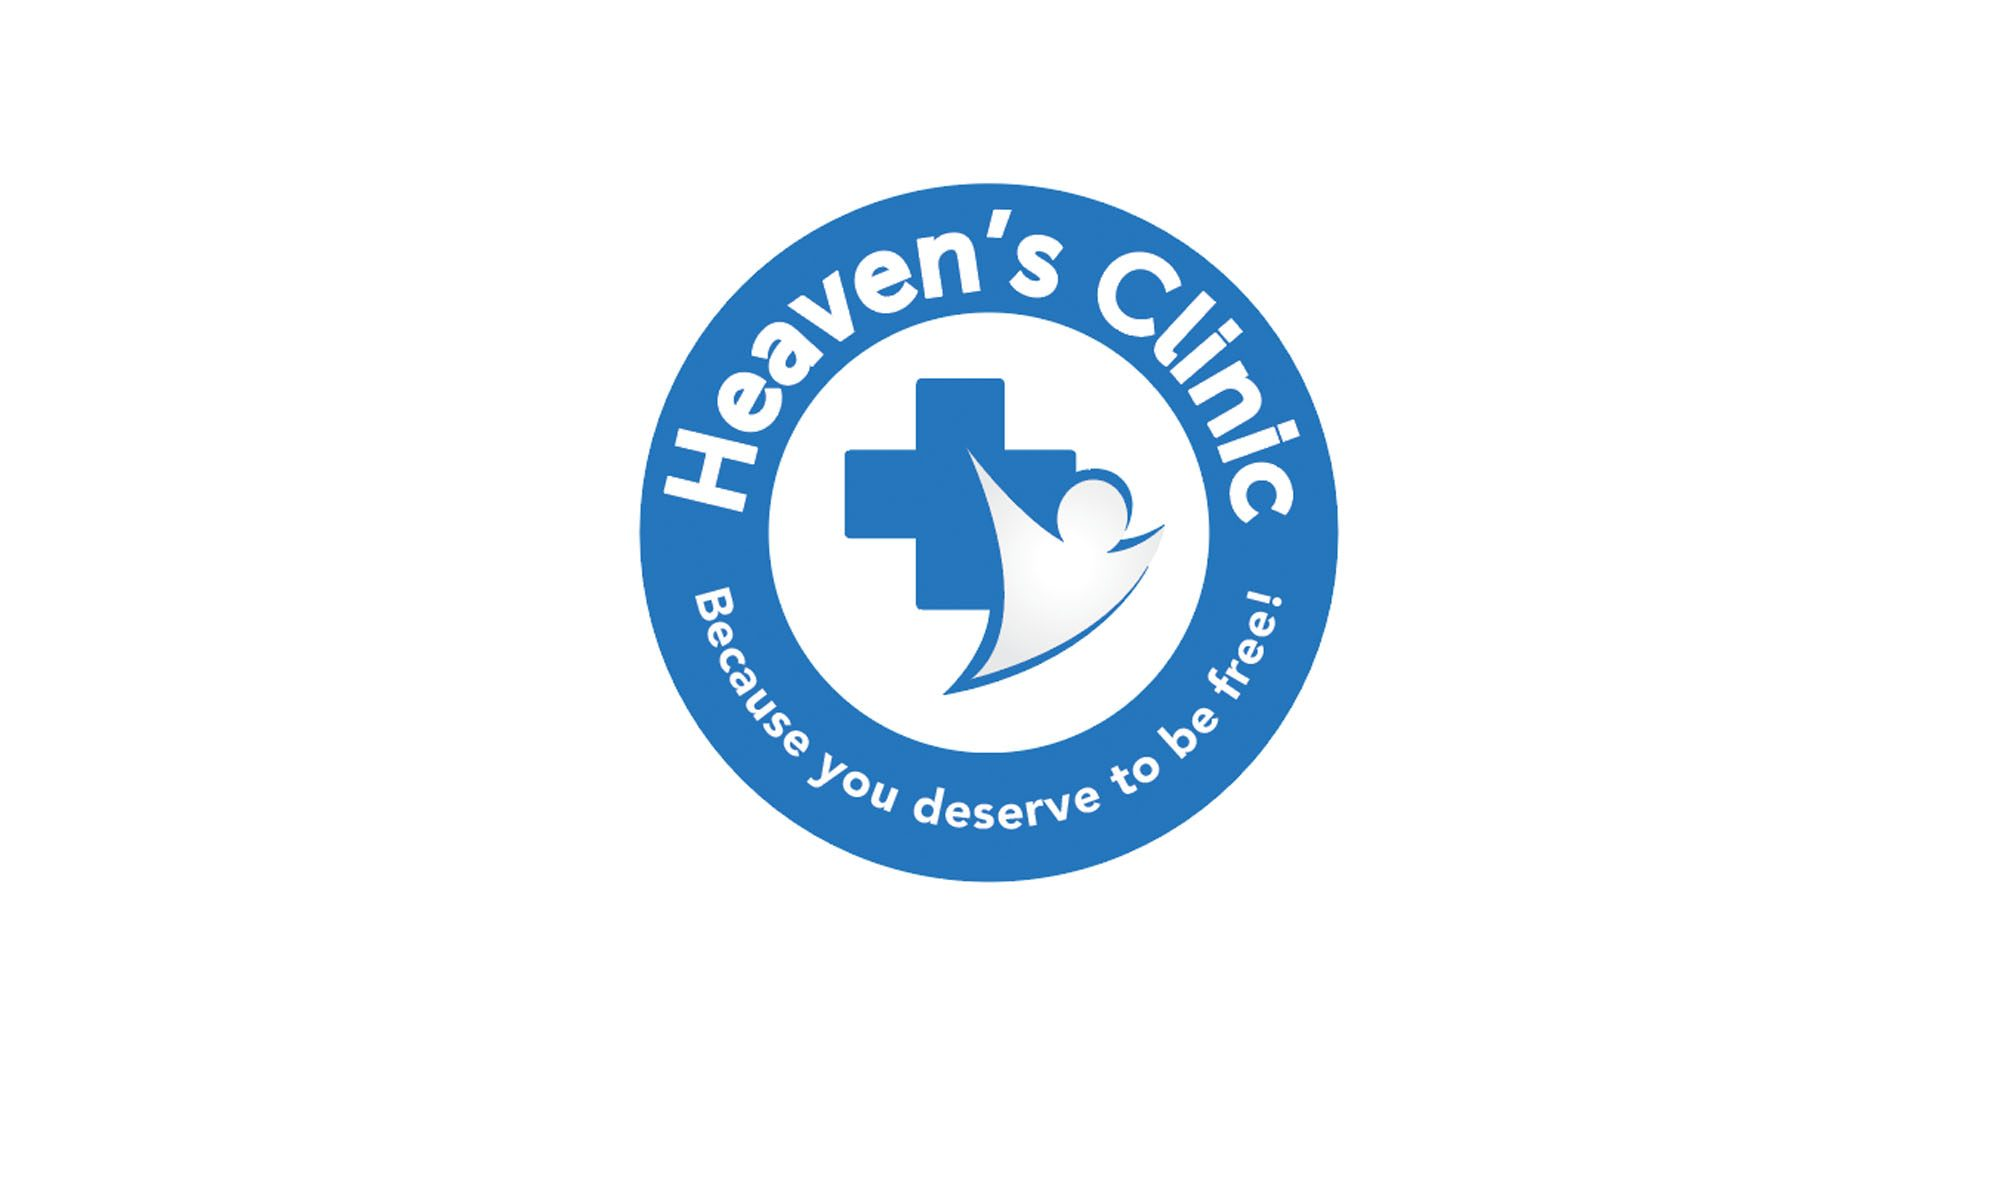 Heaven's Clinic